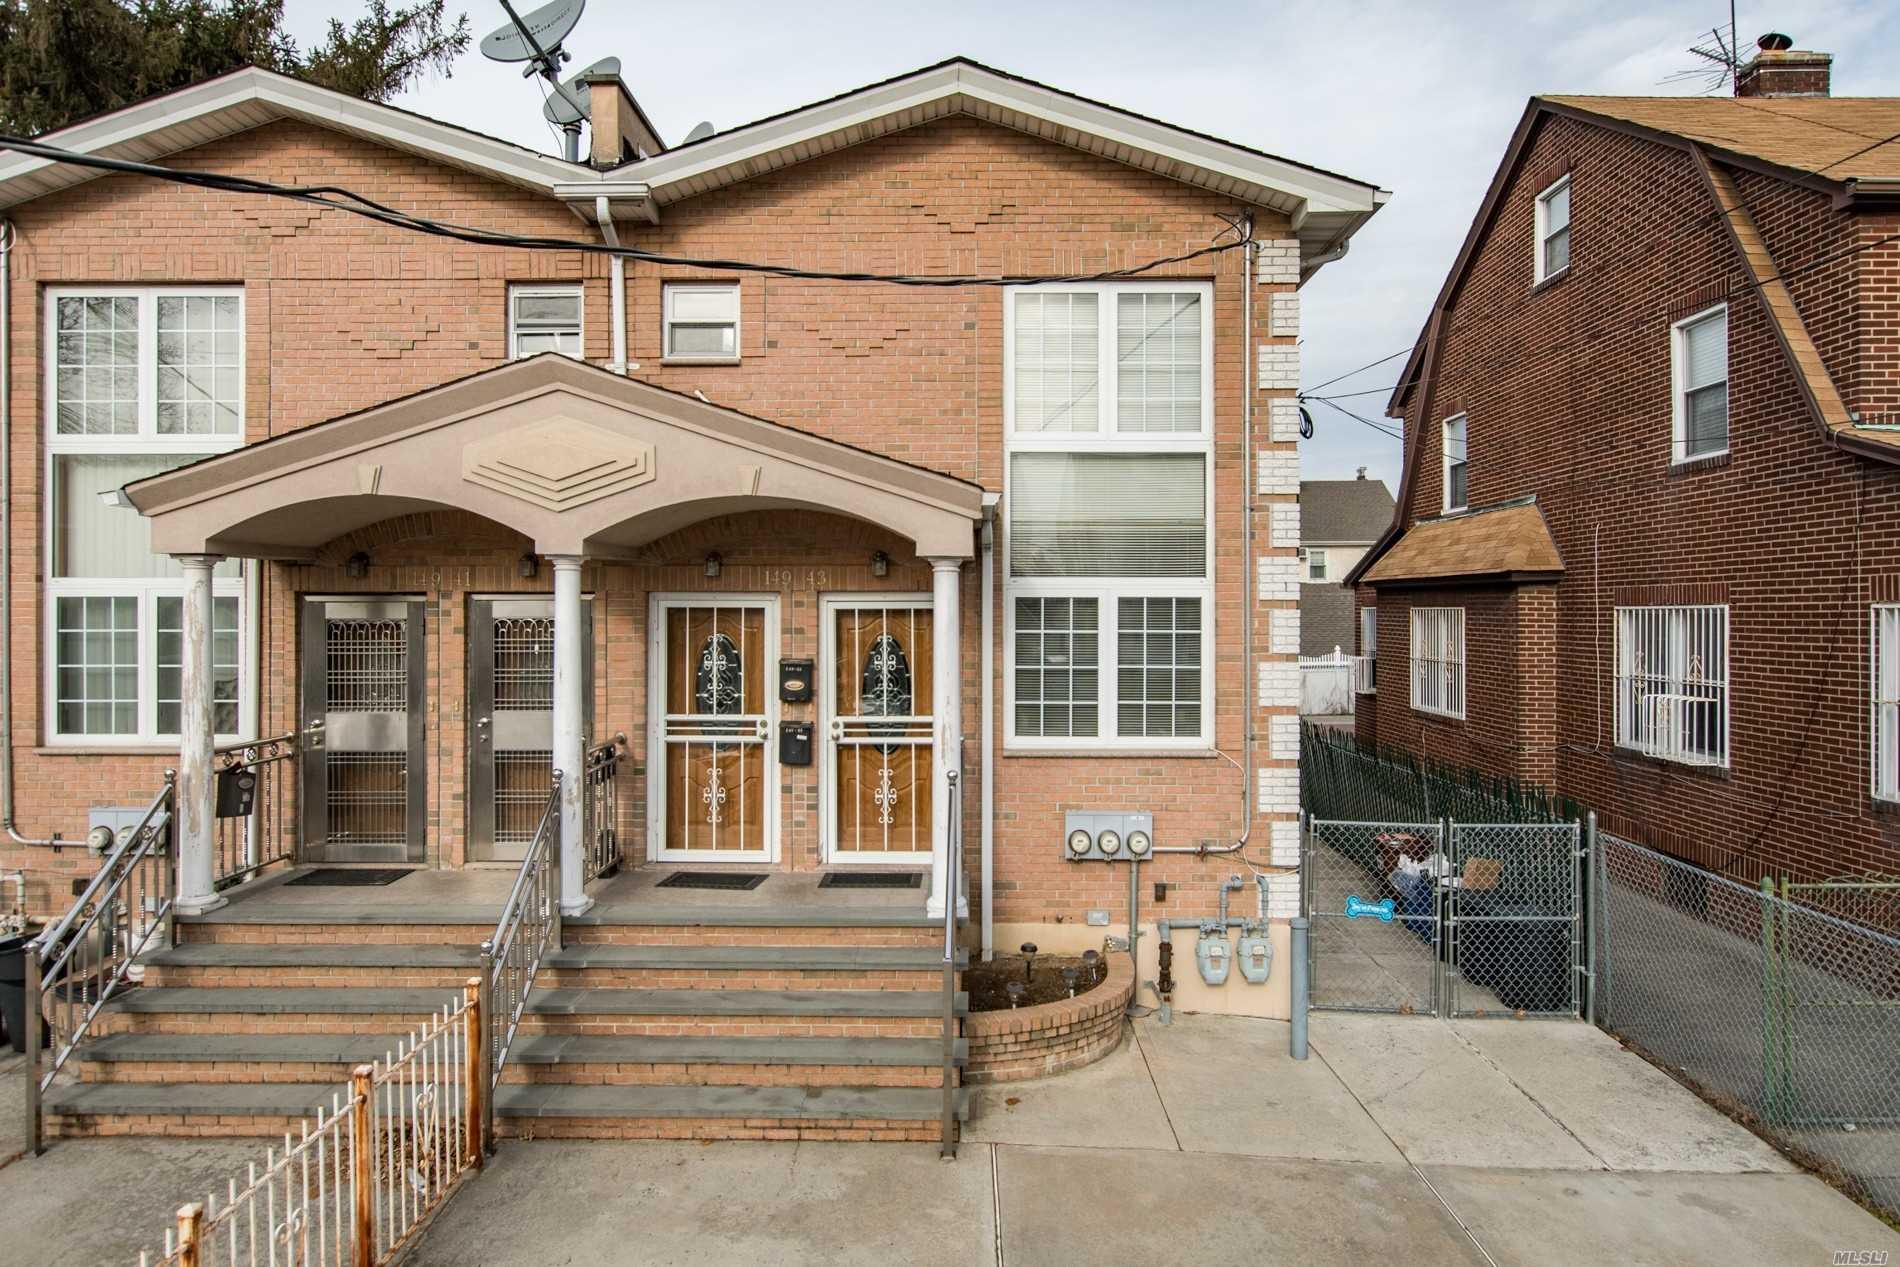 Property for sale at 149-43 20 Avenue, Whitestone NY 11357, Whitestone,  New York 11357